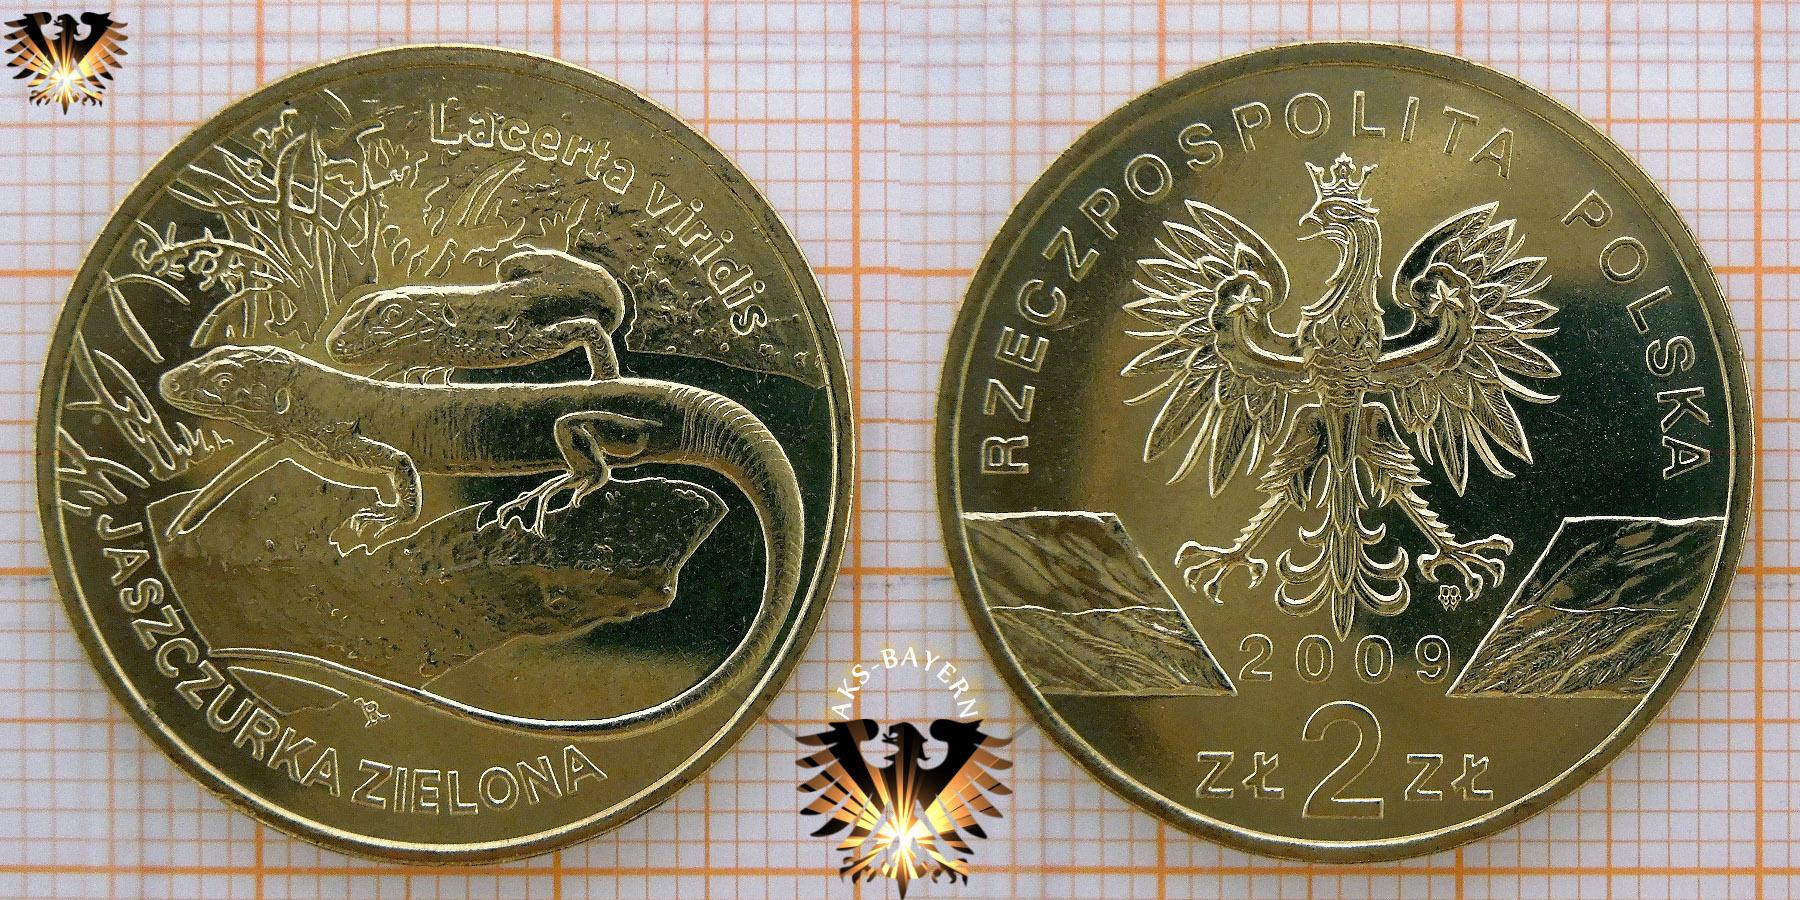 Münze 2 Złote Polen 2009 Lacerta Viridis Jaszczurka Zielona